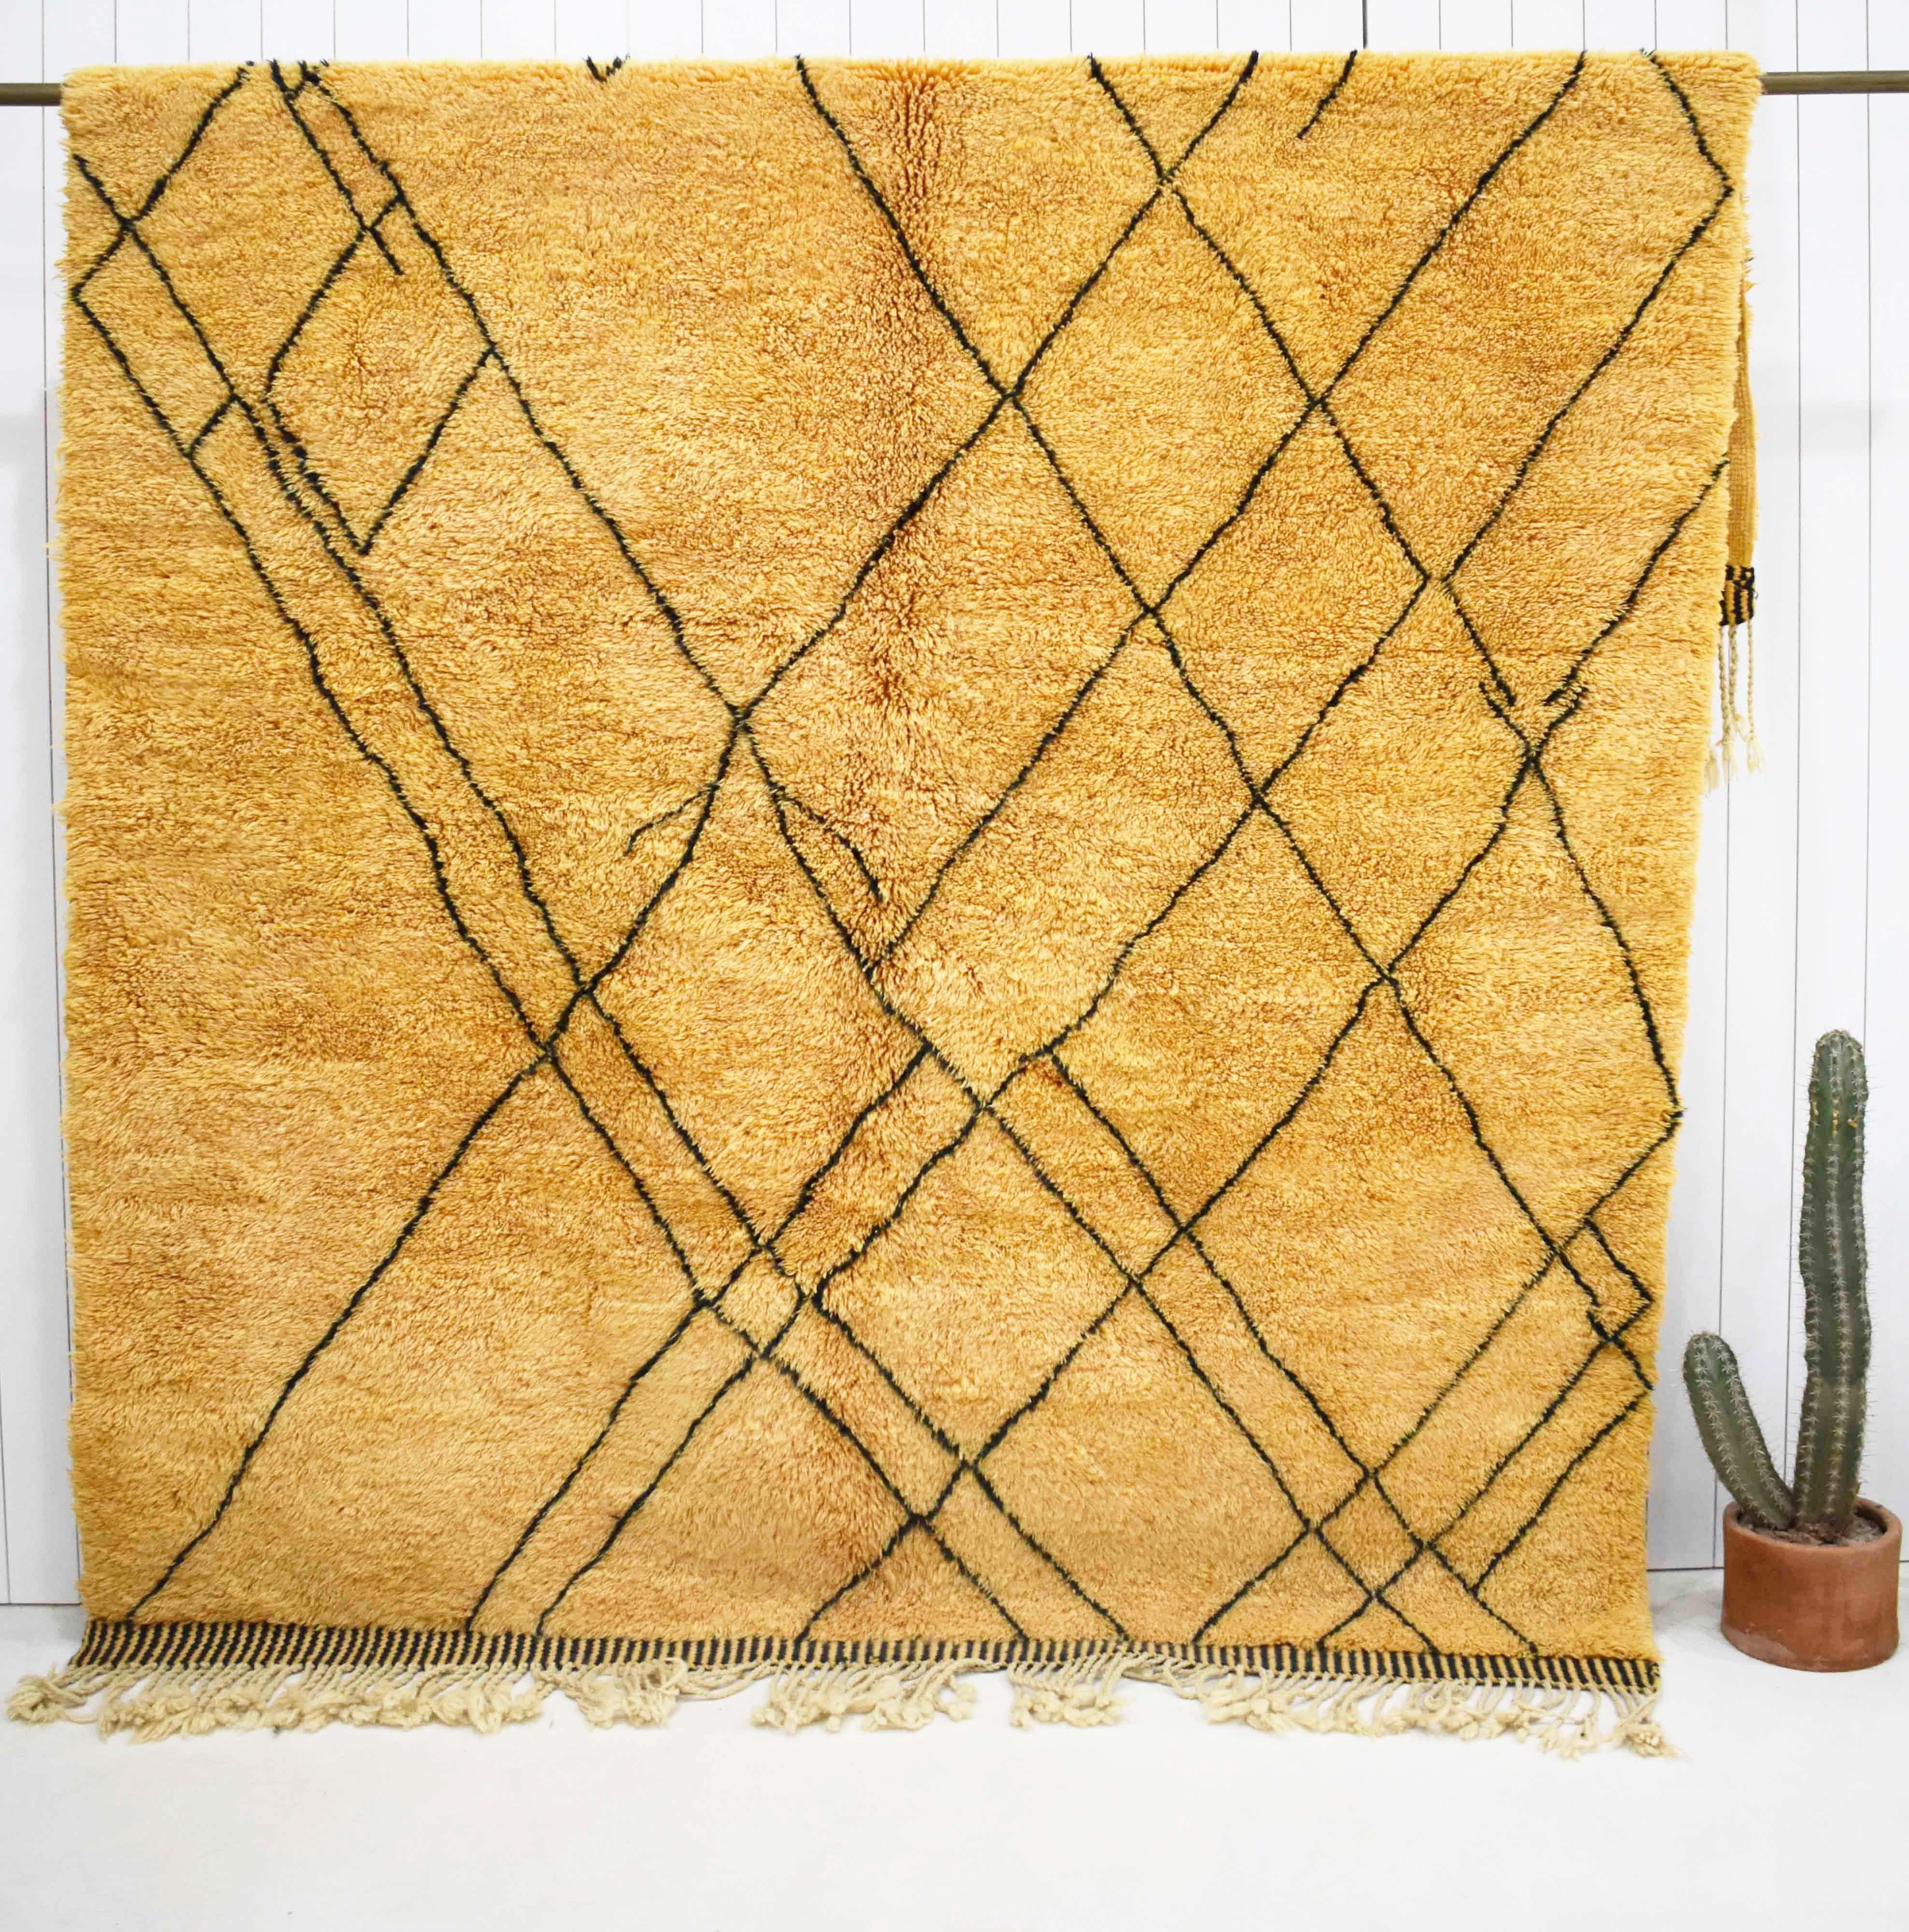 Orange Mrirt berber carpet with lines